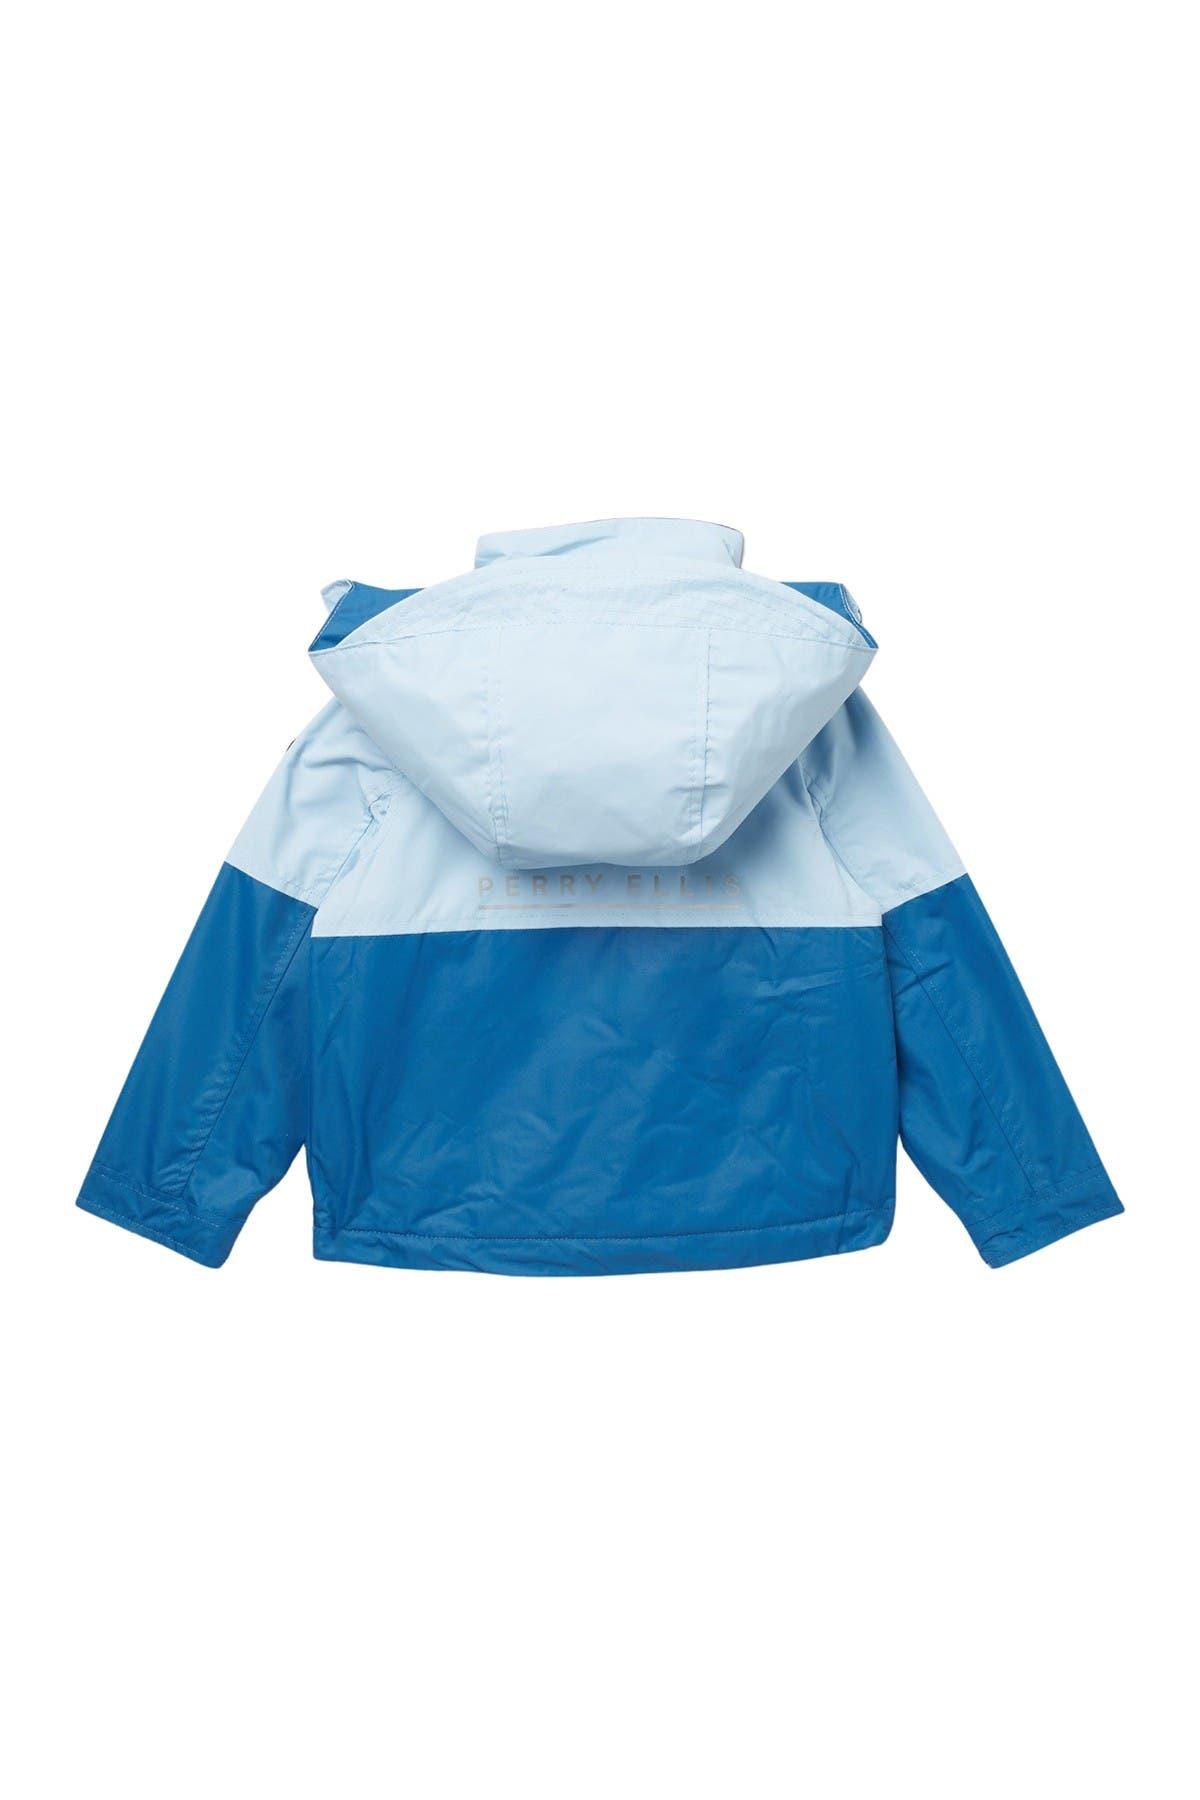 Image of Perry Ellis Colorblock Fleece Lined Jacket